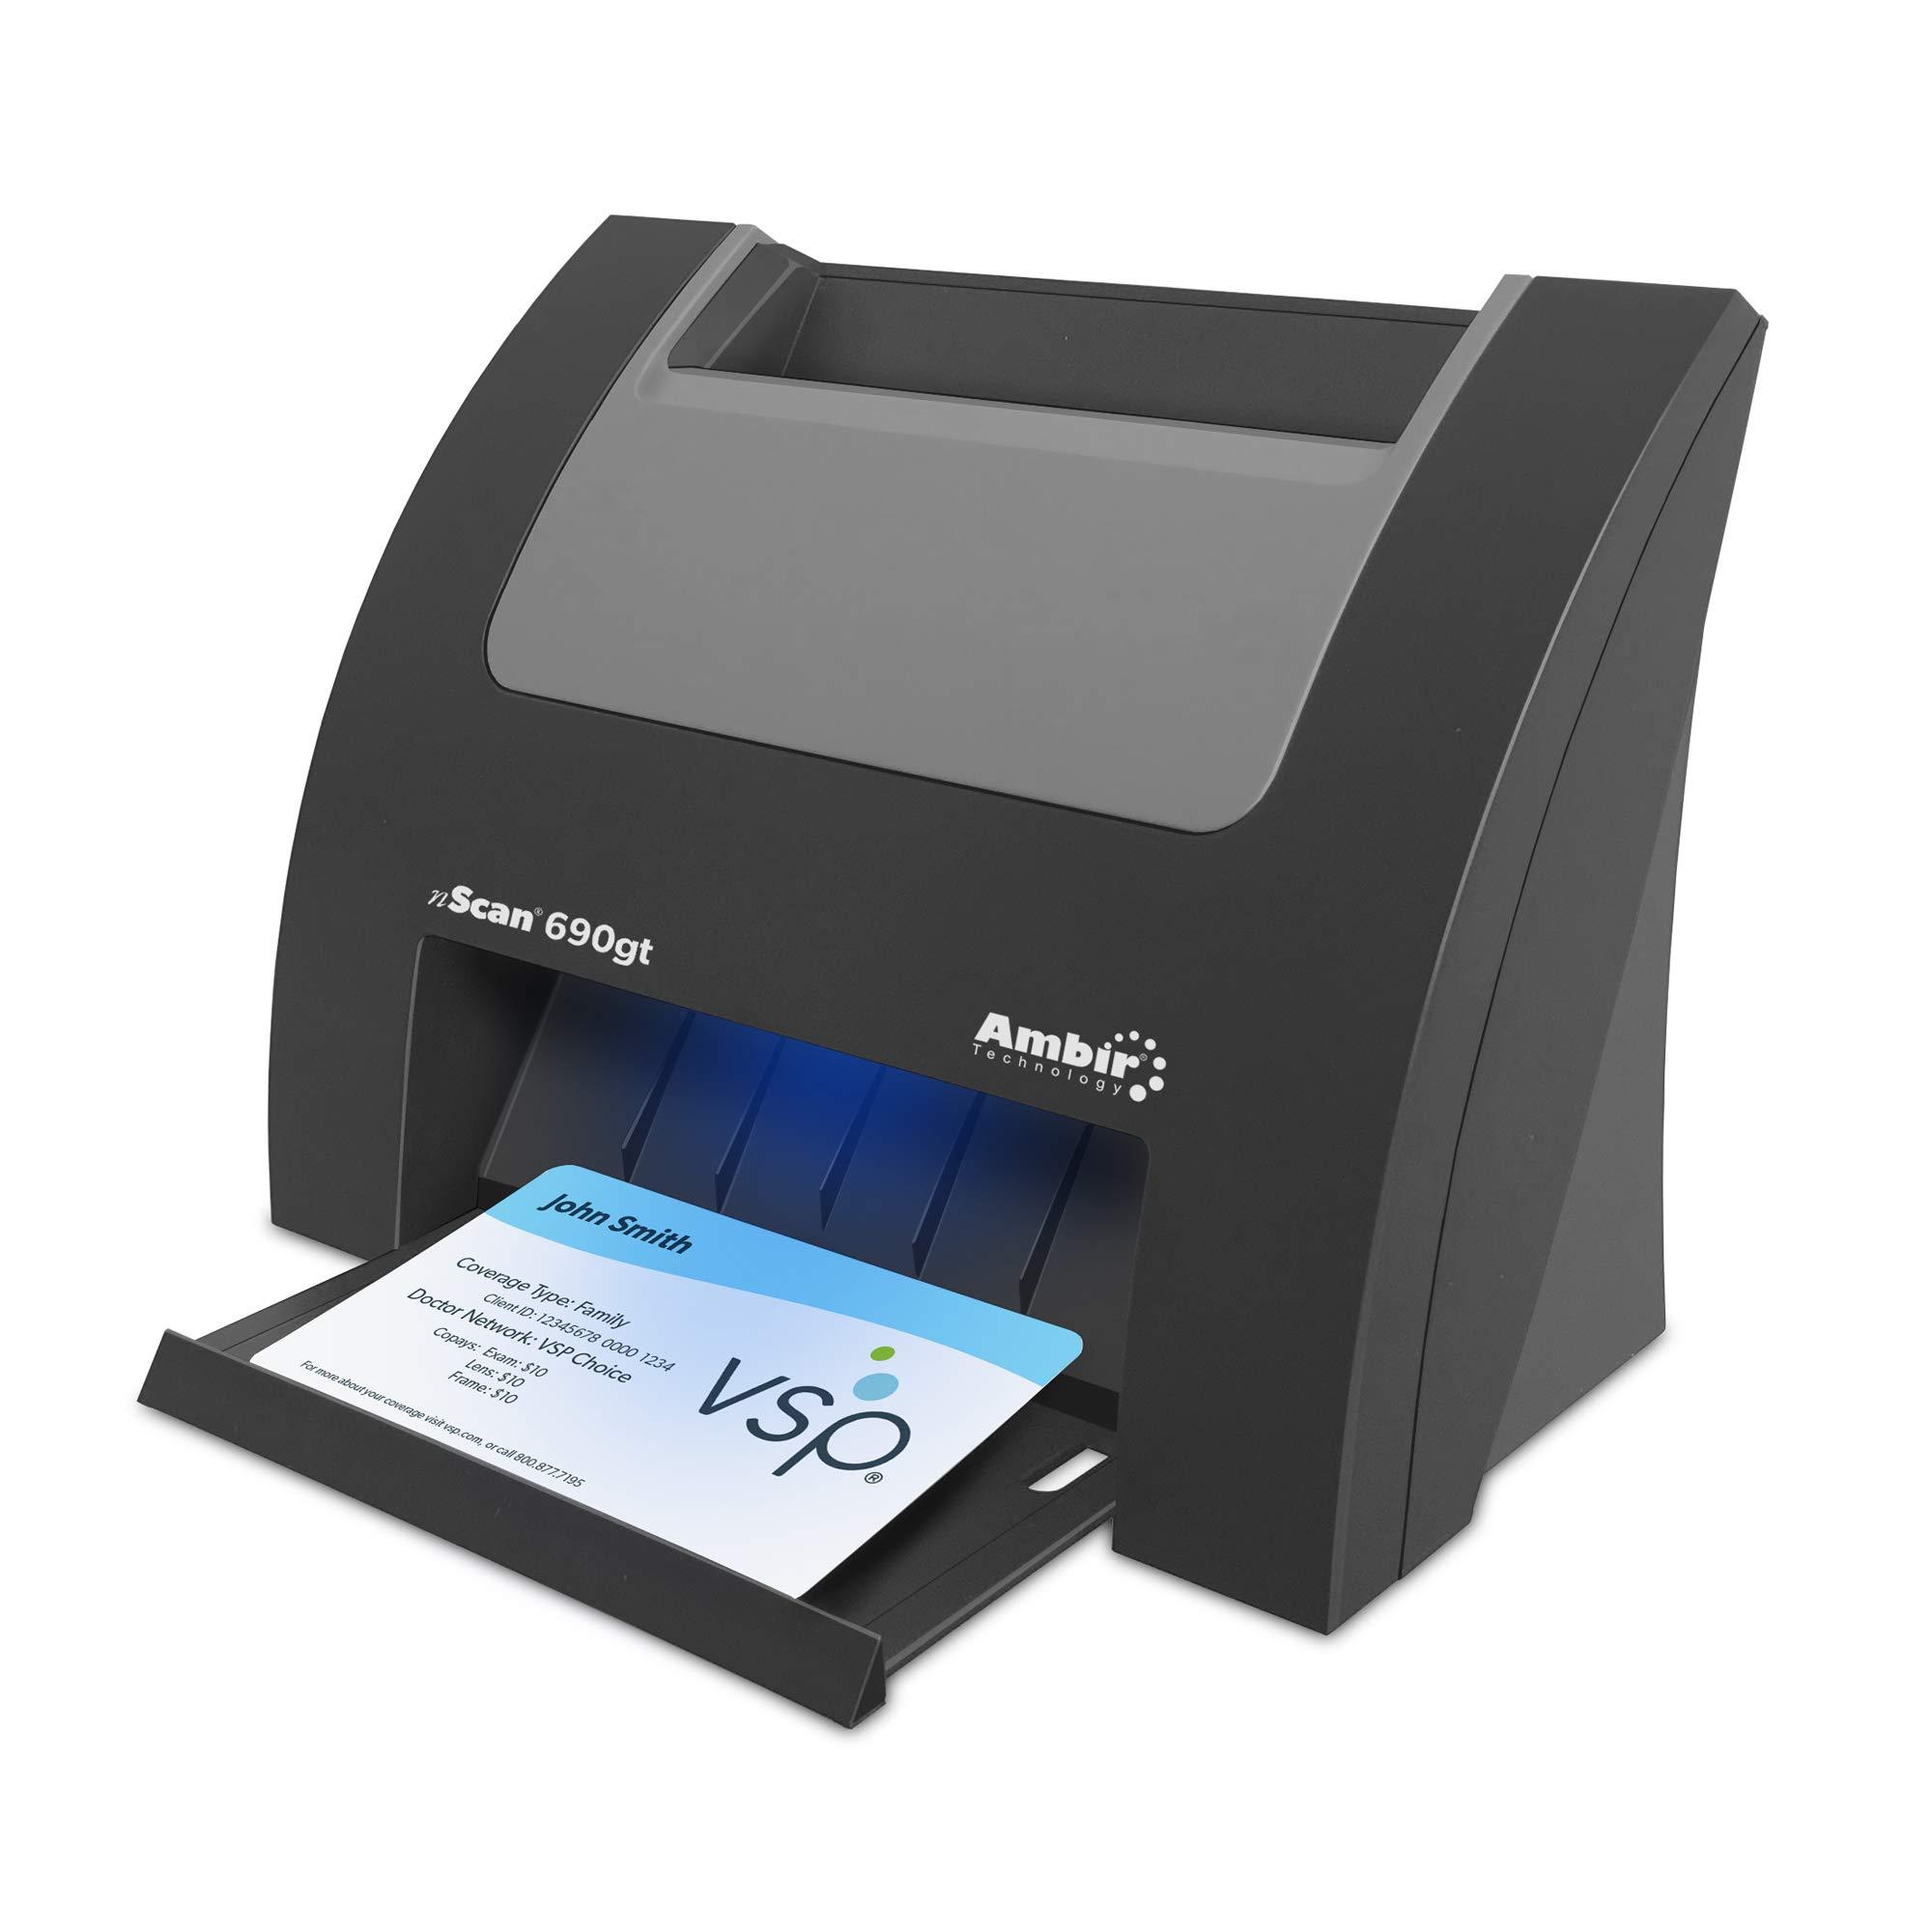 Ambir nScan 690gt High-Speed Vertical Card Scanner by Ambir